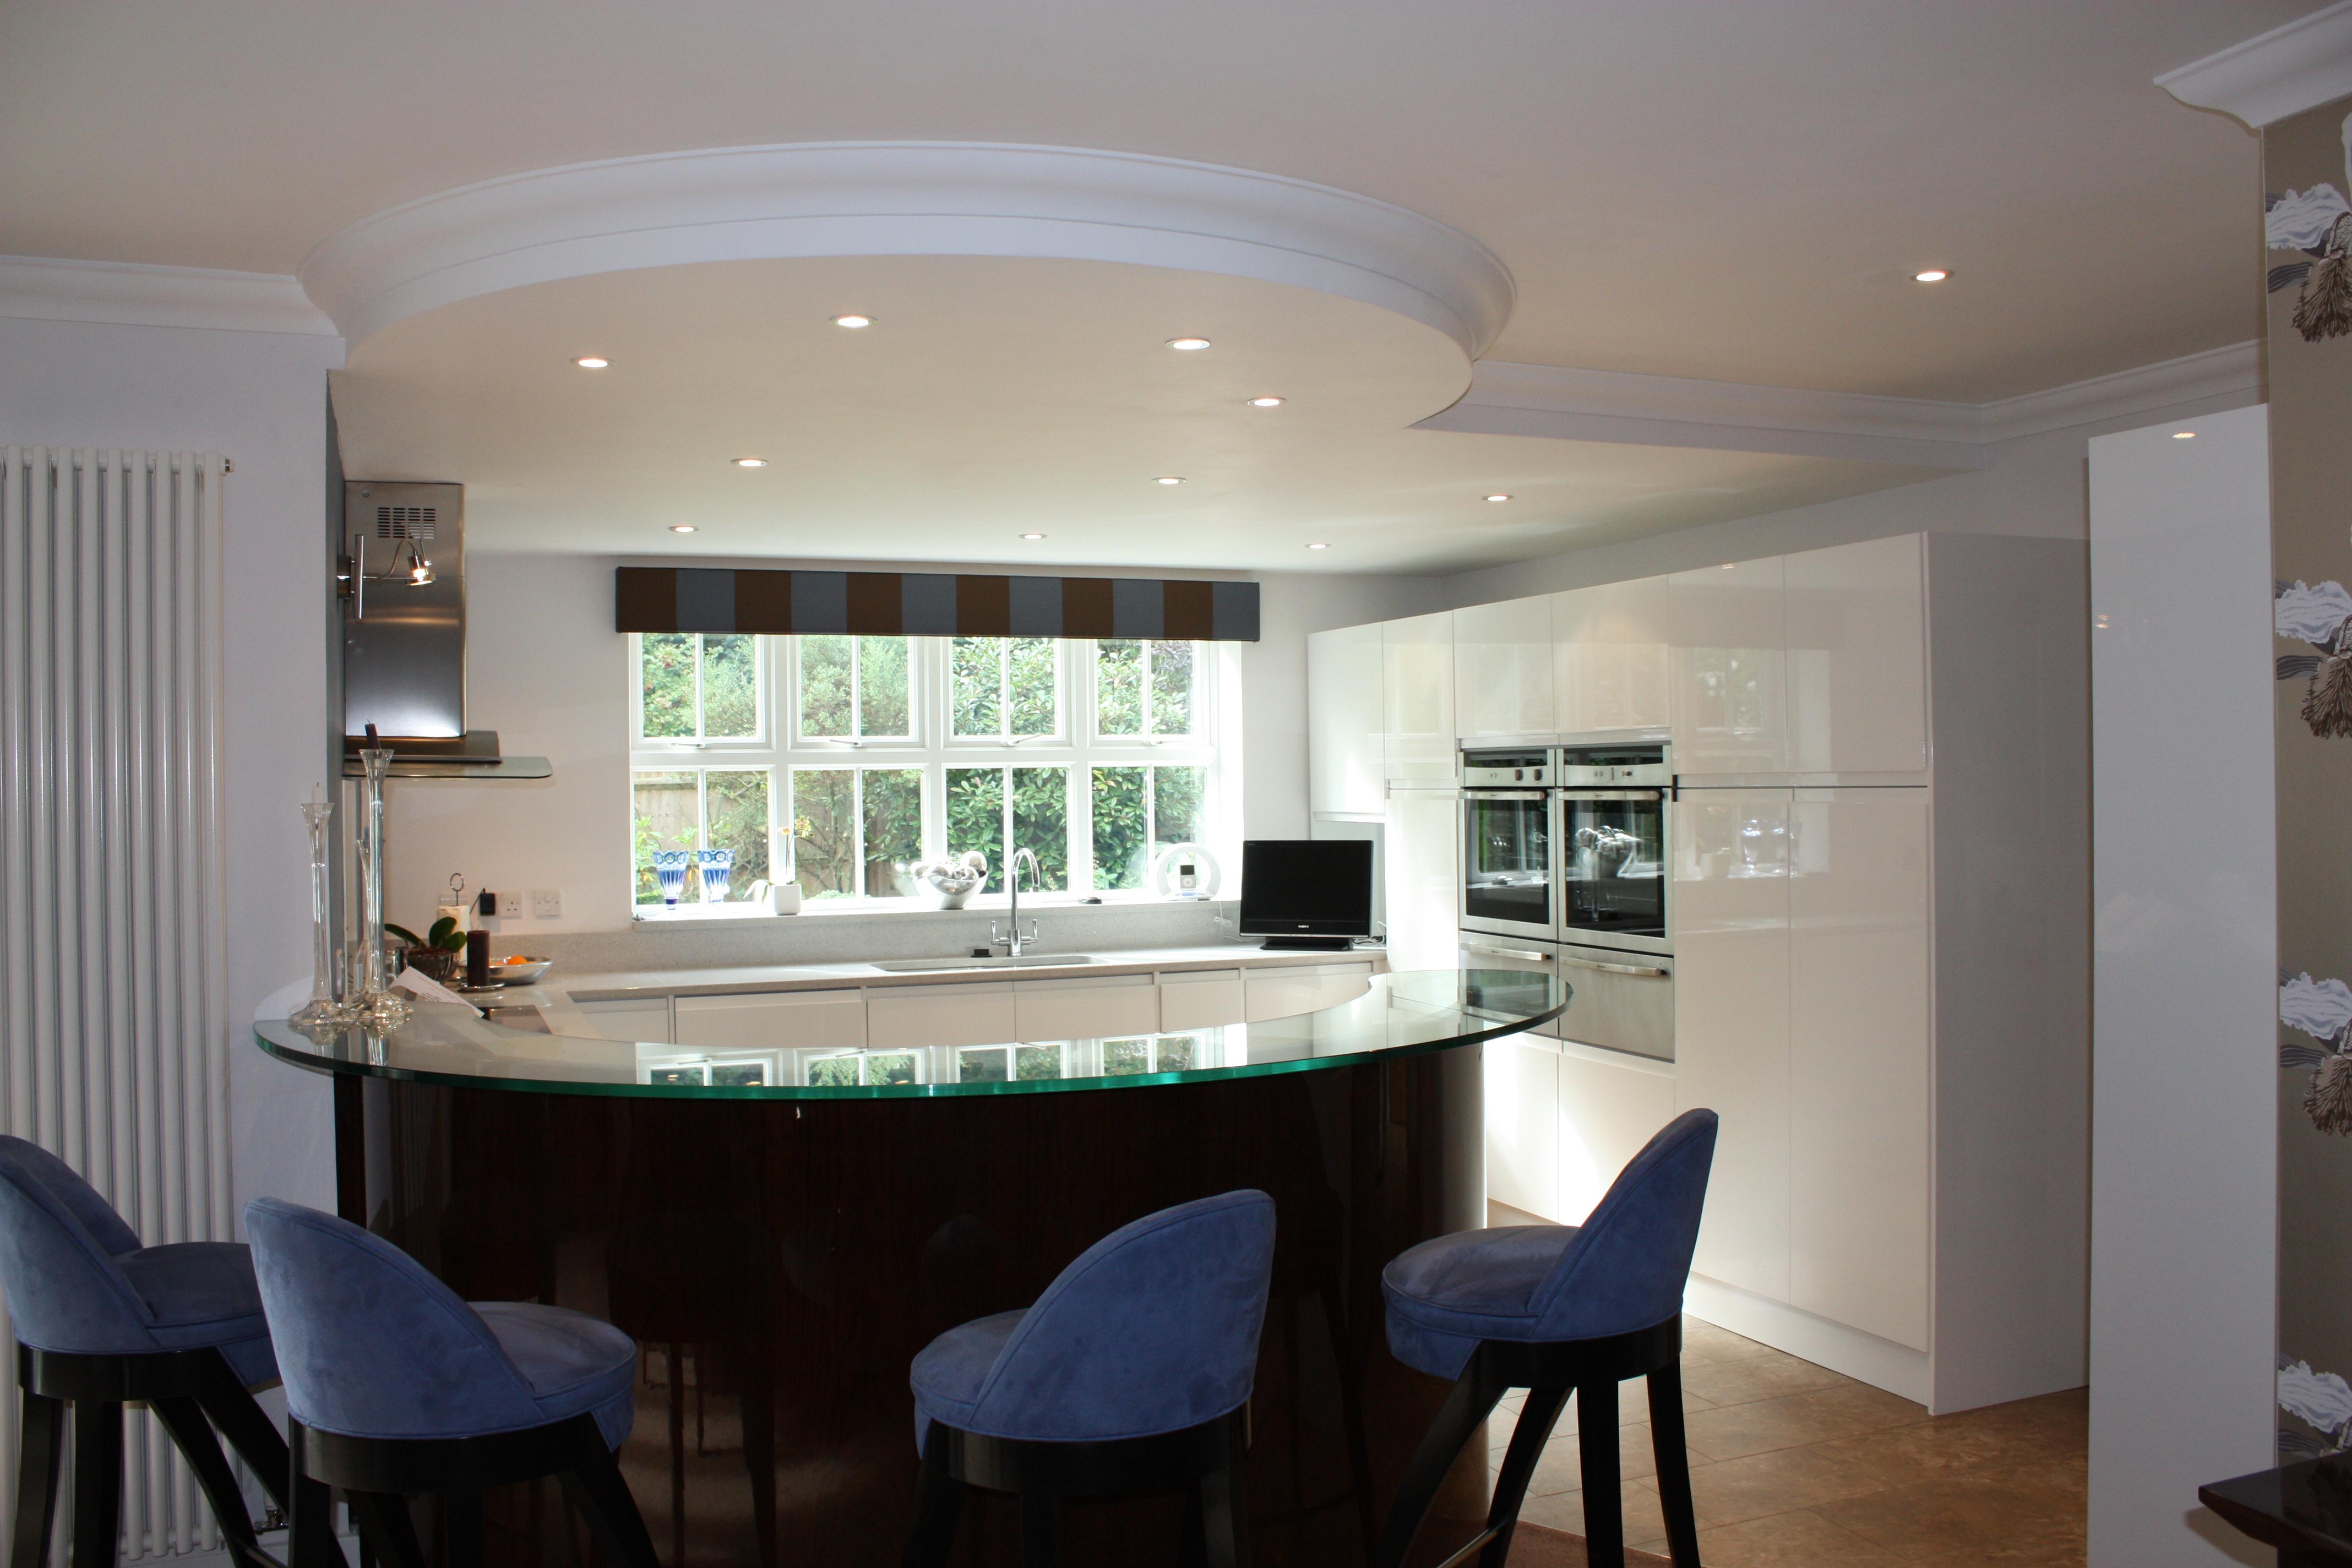 oval kitchen island